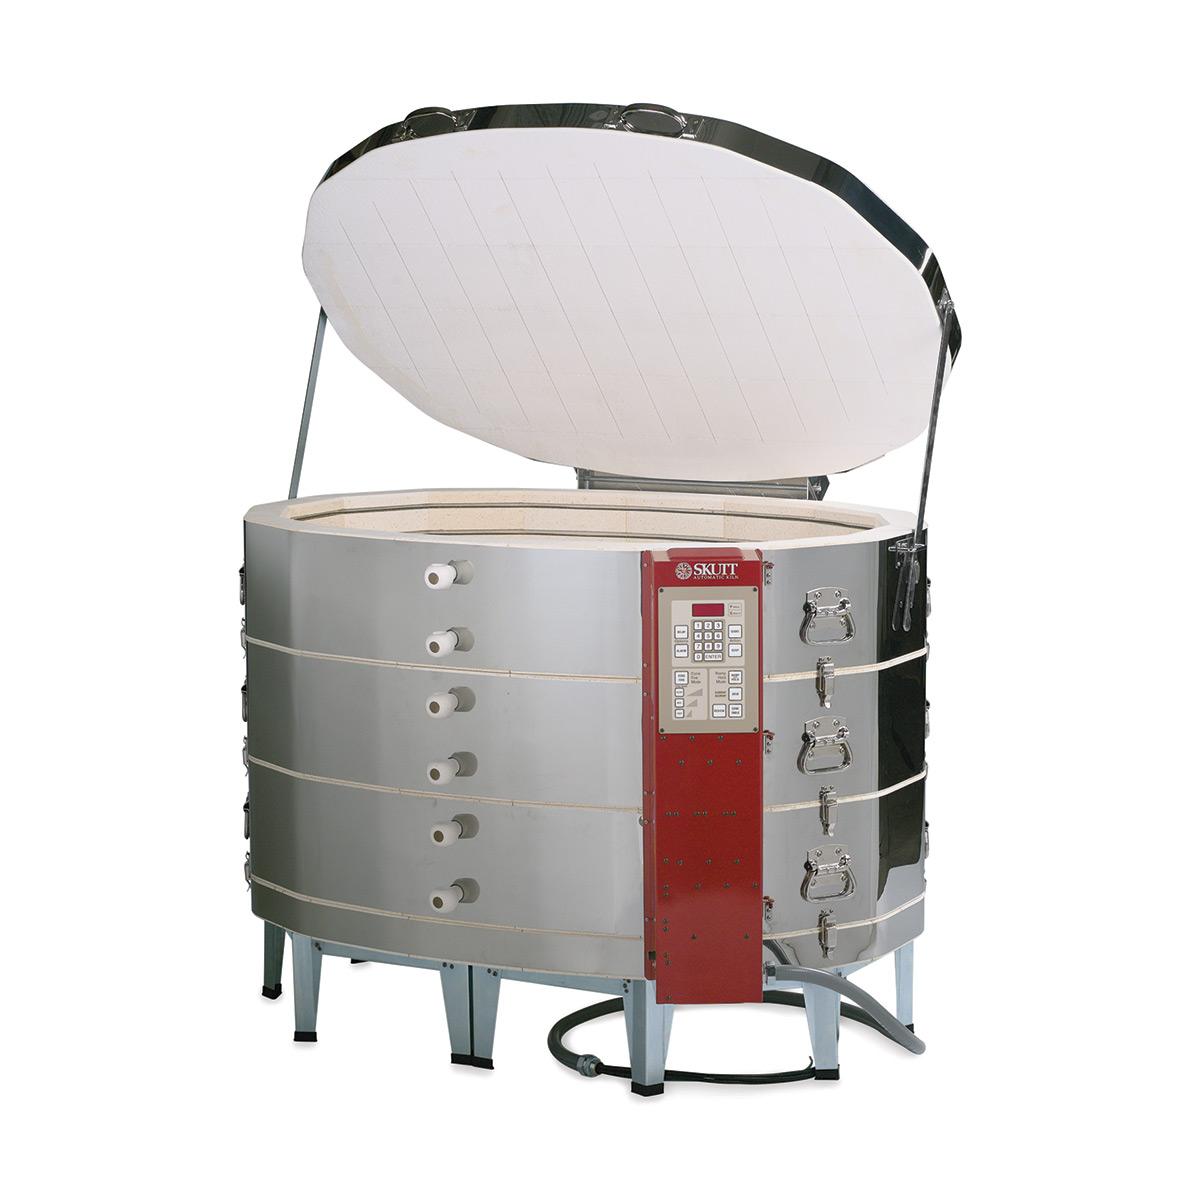 Skutt KM Series Kilnmaster Automatic Kiln - KM-1627-3PK, Cone 10, 240V, 3P, 66A